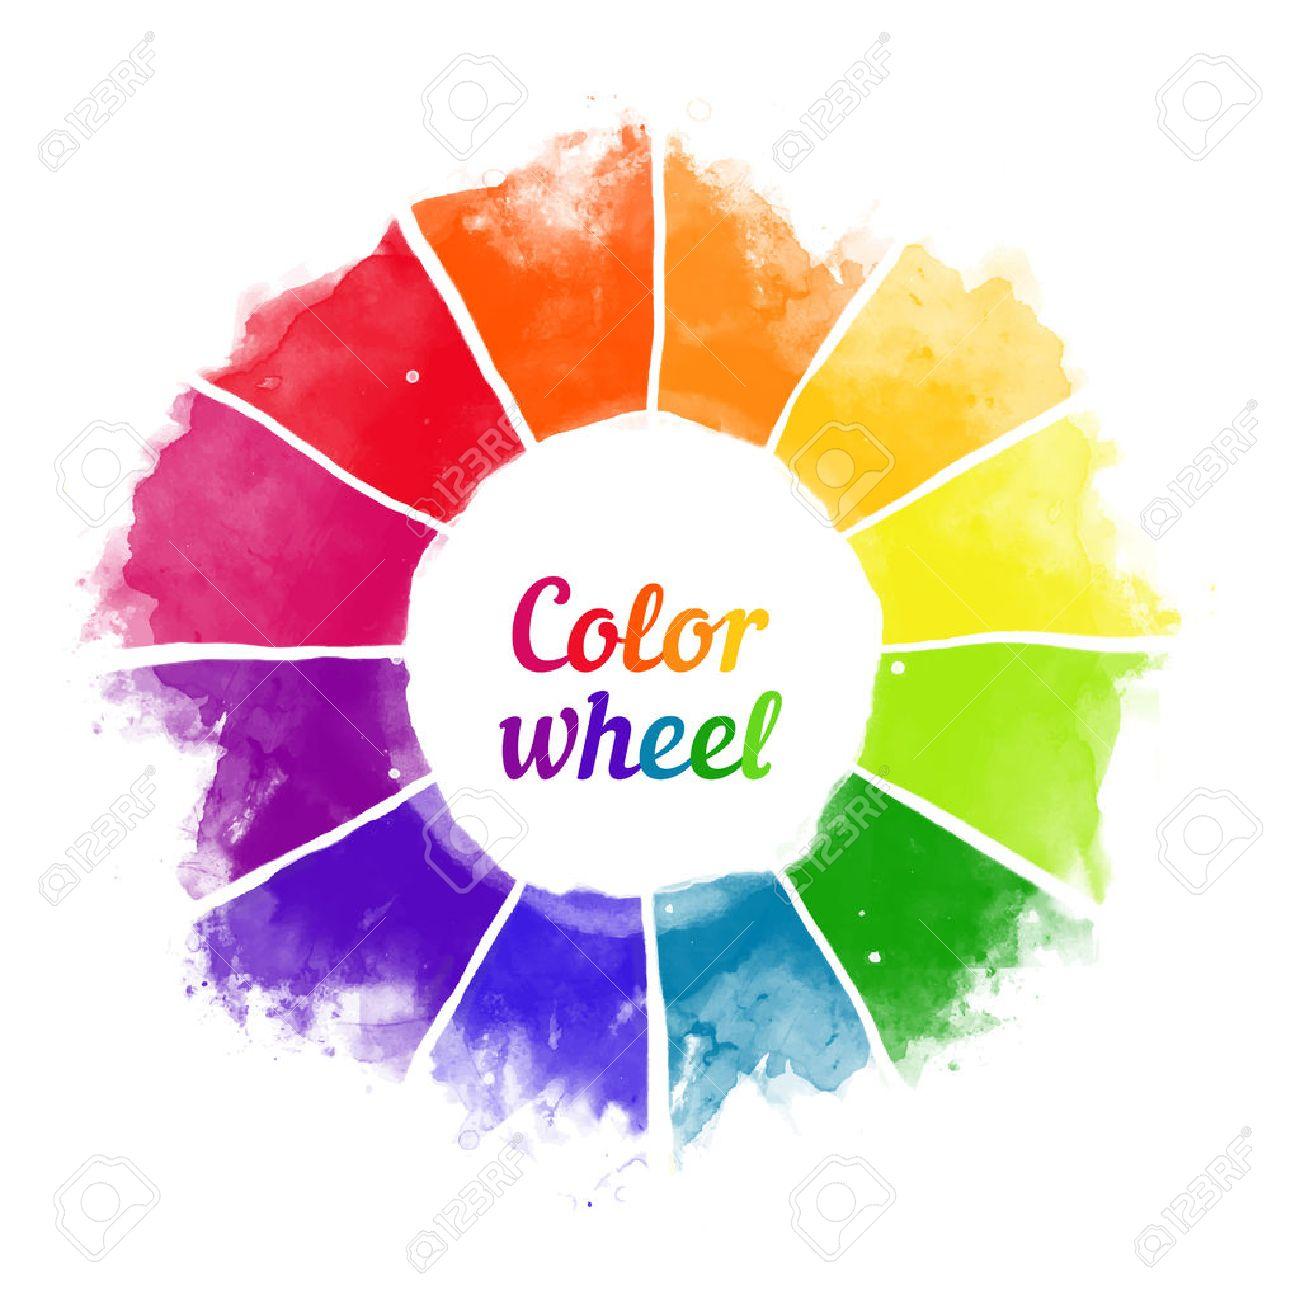 Handmade color wheel. Isolated watercolor spectrum. Vector illustration. - 43027735